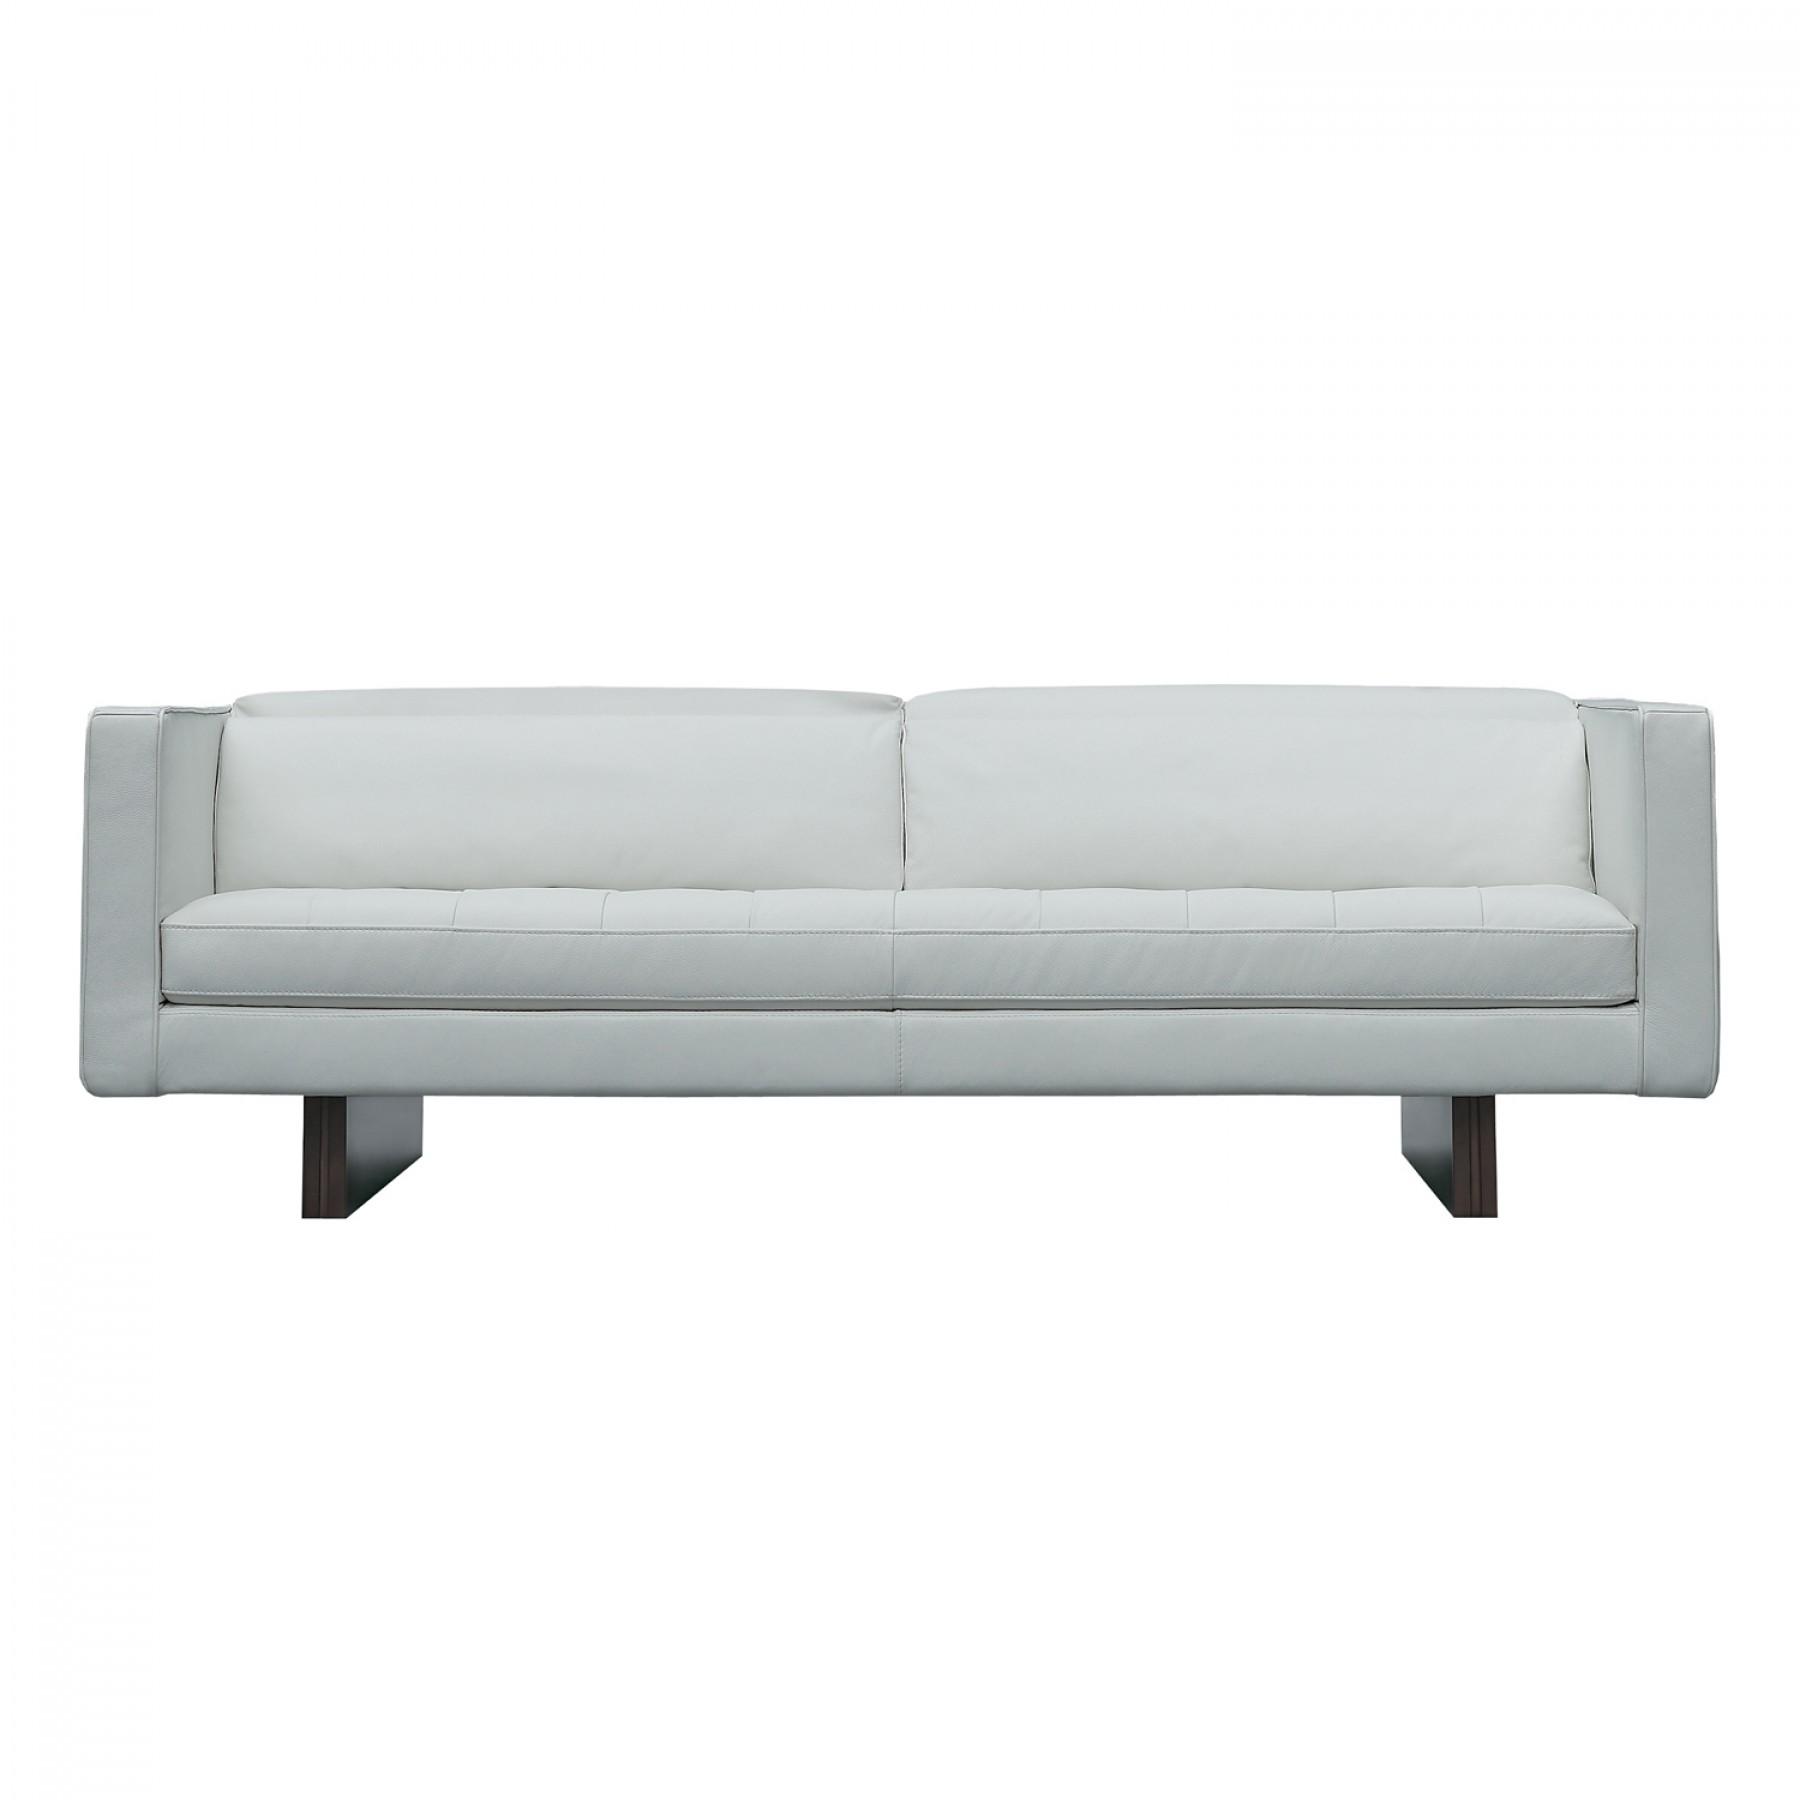 SORANO 4 SEAT SOFA WITH HEADREST Beyond Furniture